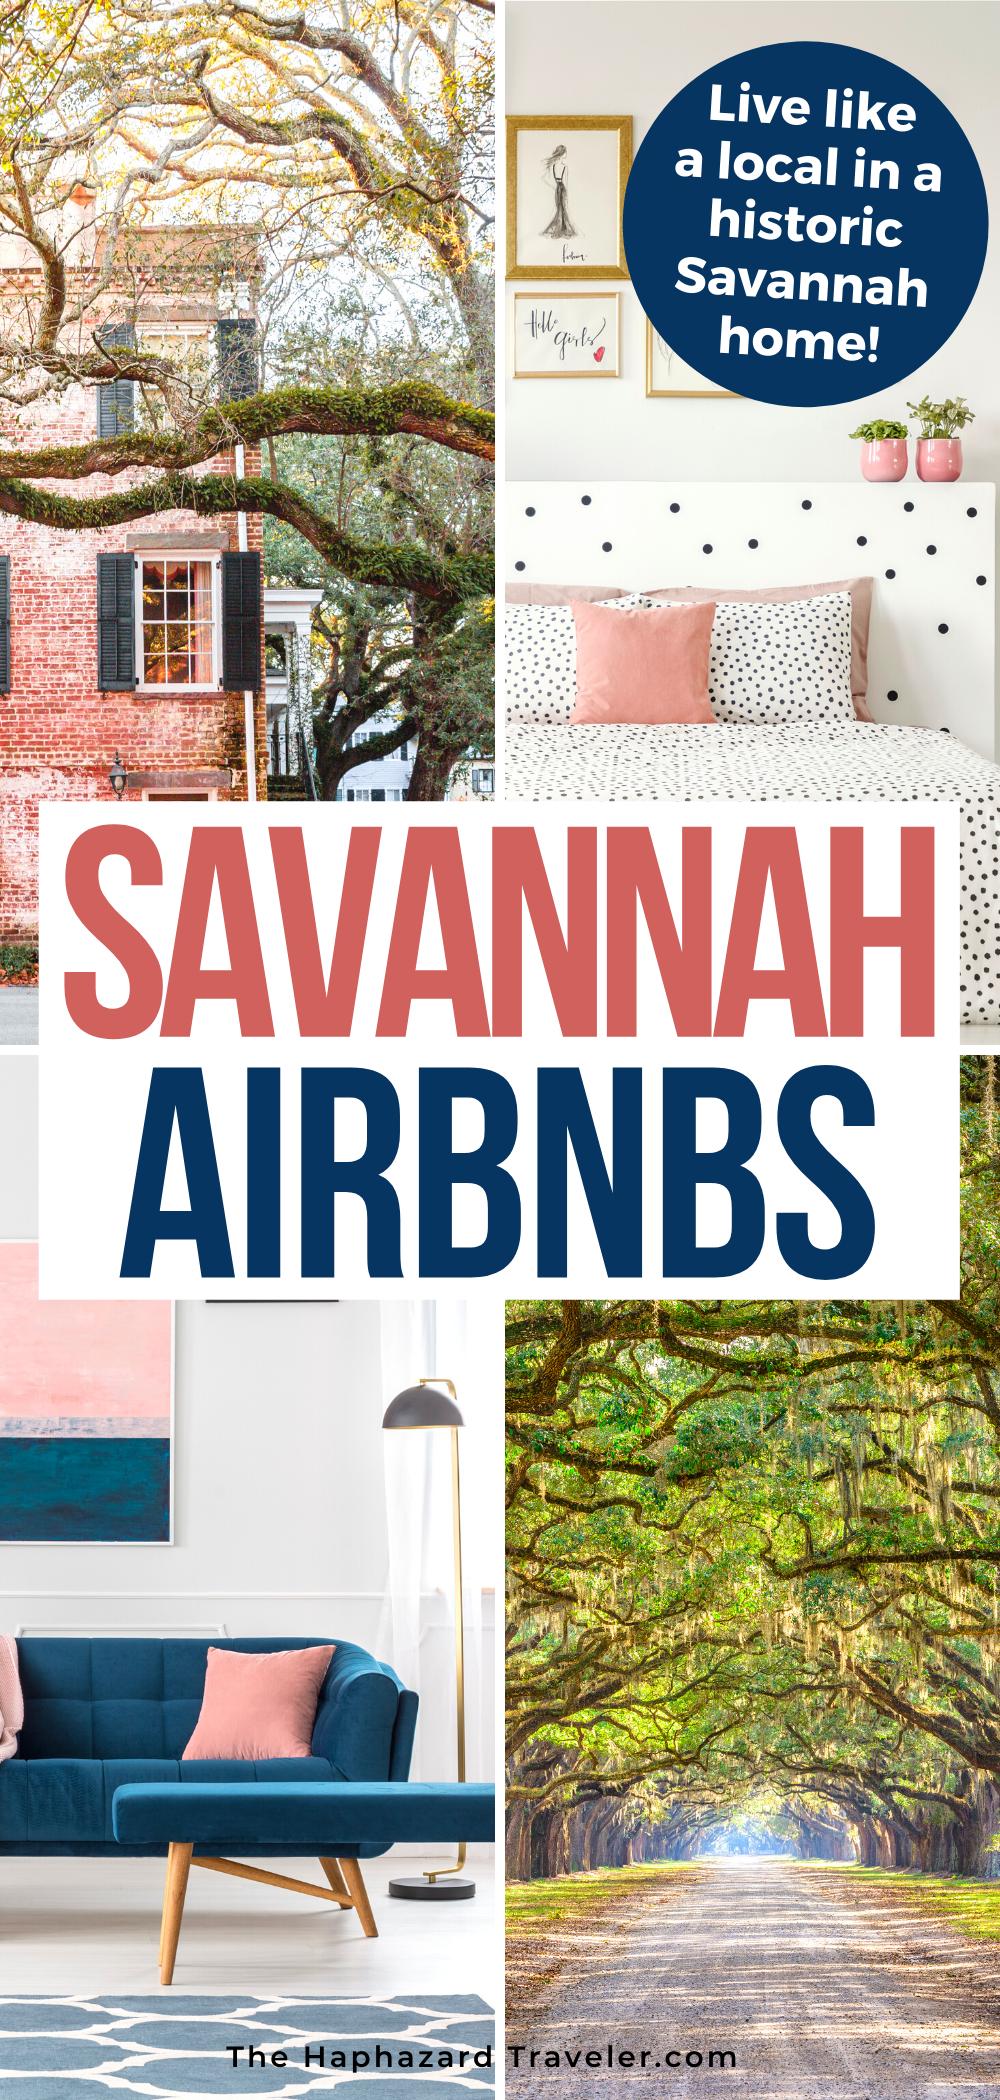 Airbnb Savannah Georgia Historic Stays Neighborhood Tips In 2021 Savannah Chat Travel Usa Vacation Usa